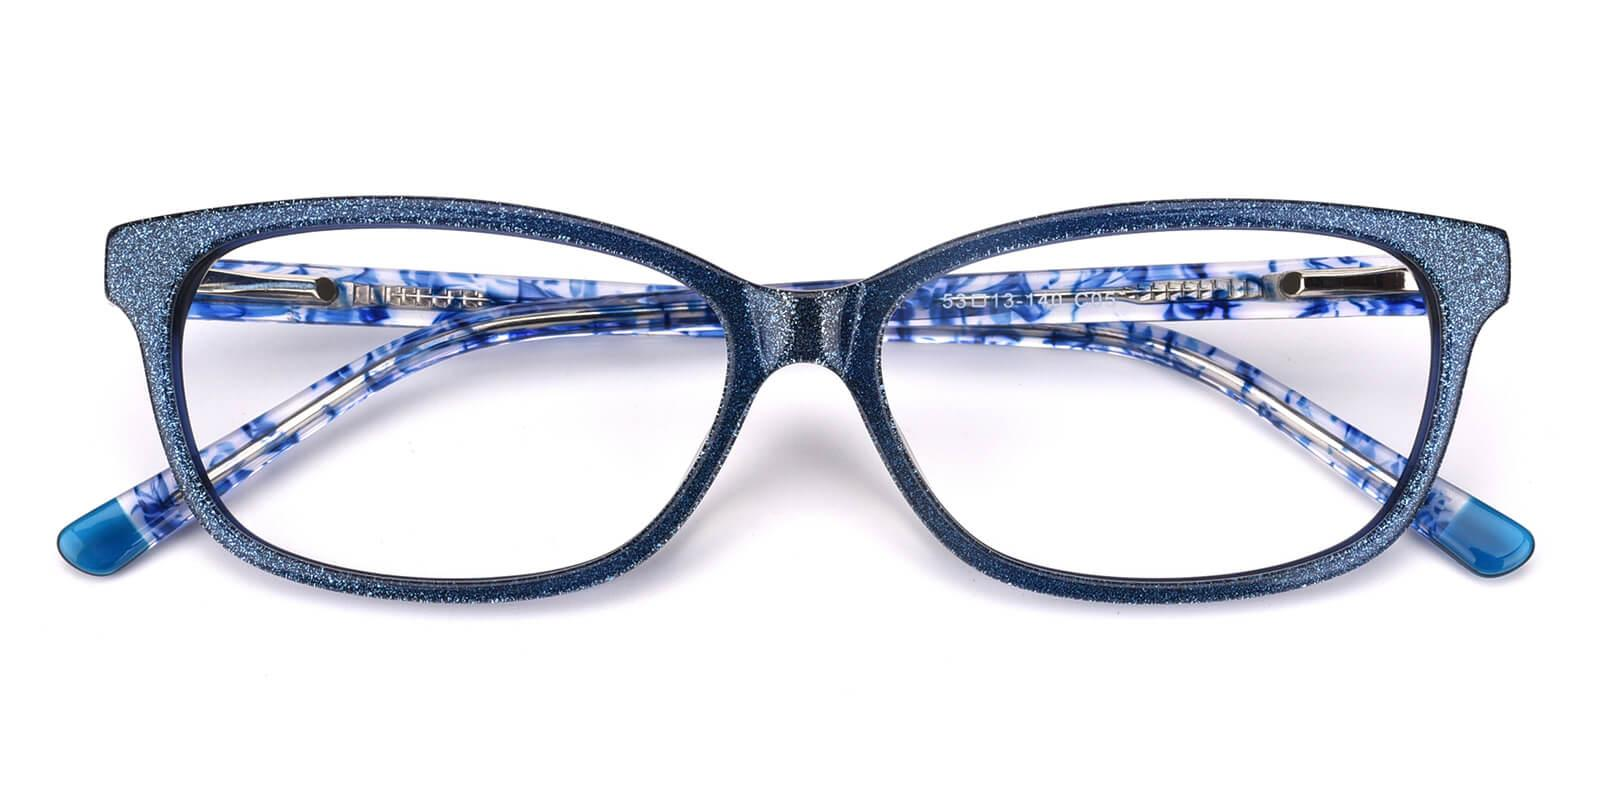 Zion-Pattern-Cat-Acetate-Eyeglasses-detail